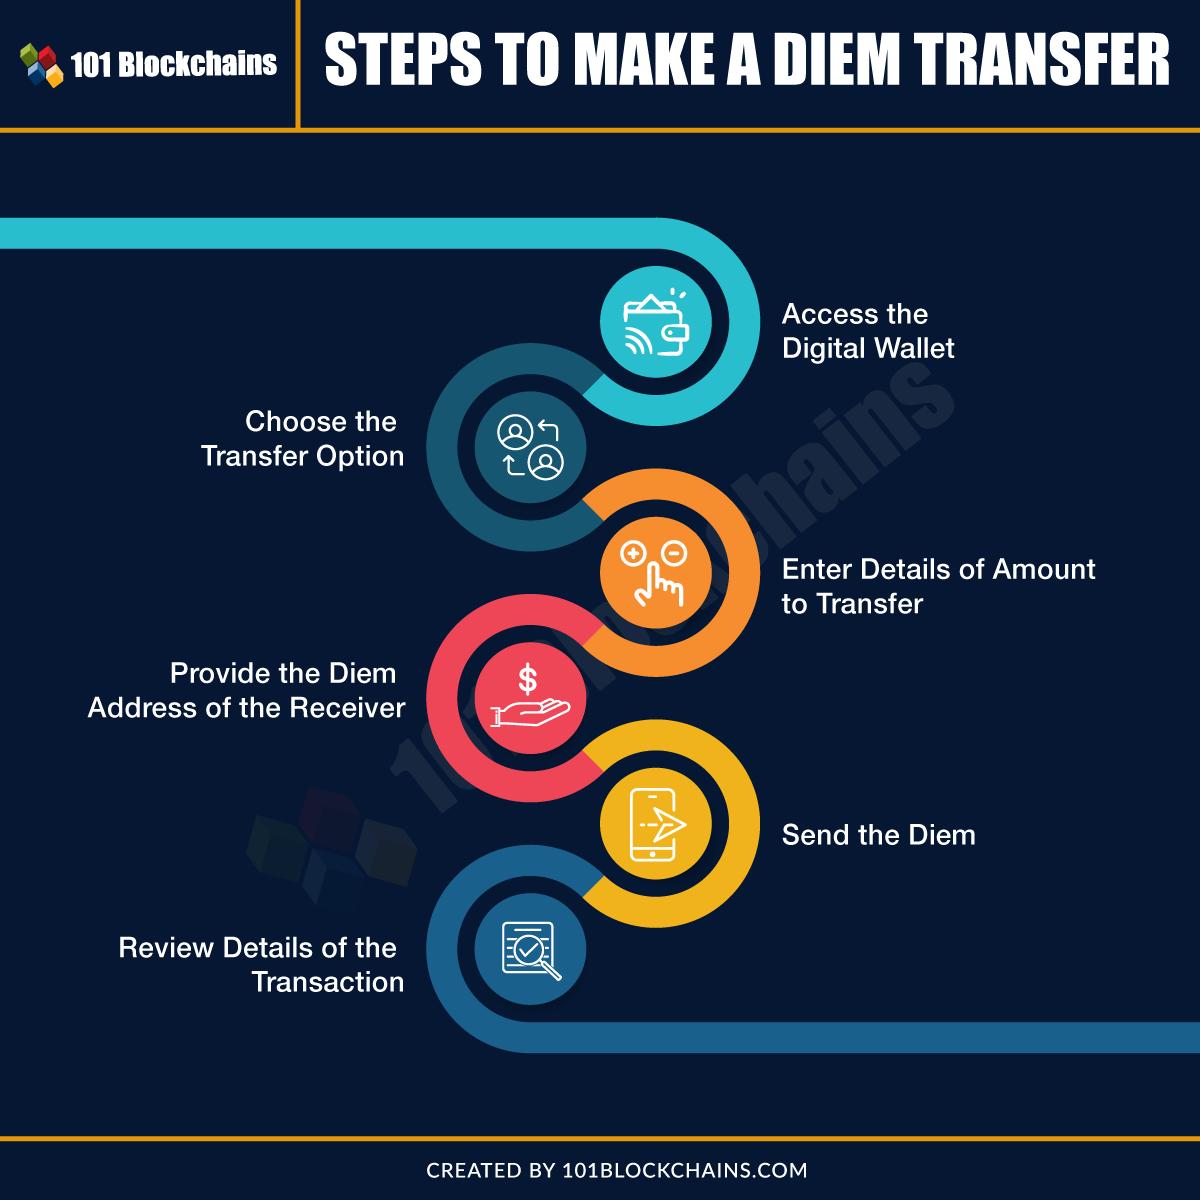 diem transfer process